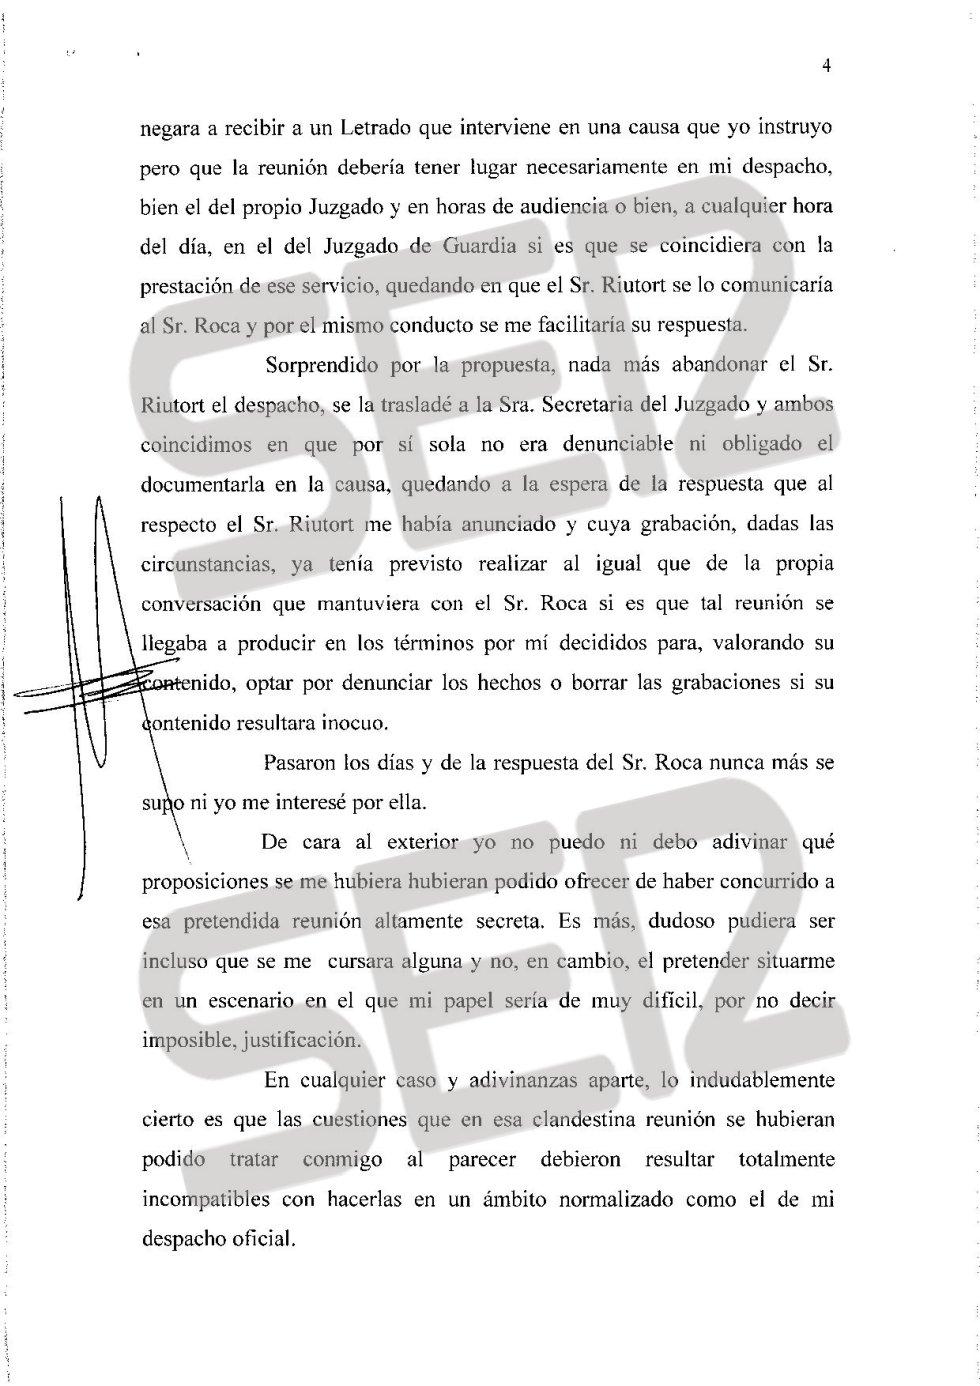 Carta íntegra de José Castro a Santiago Pedraz (página 4/6).